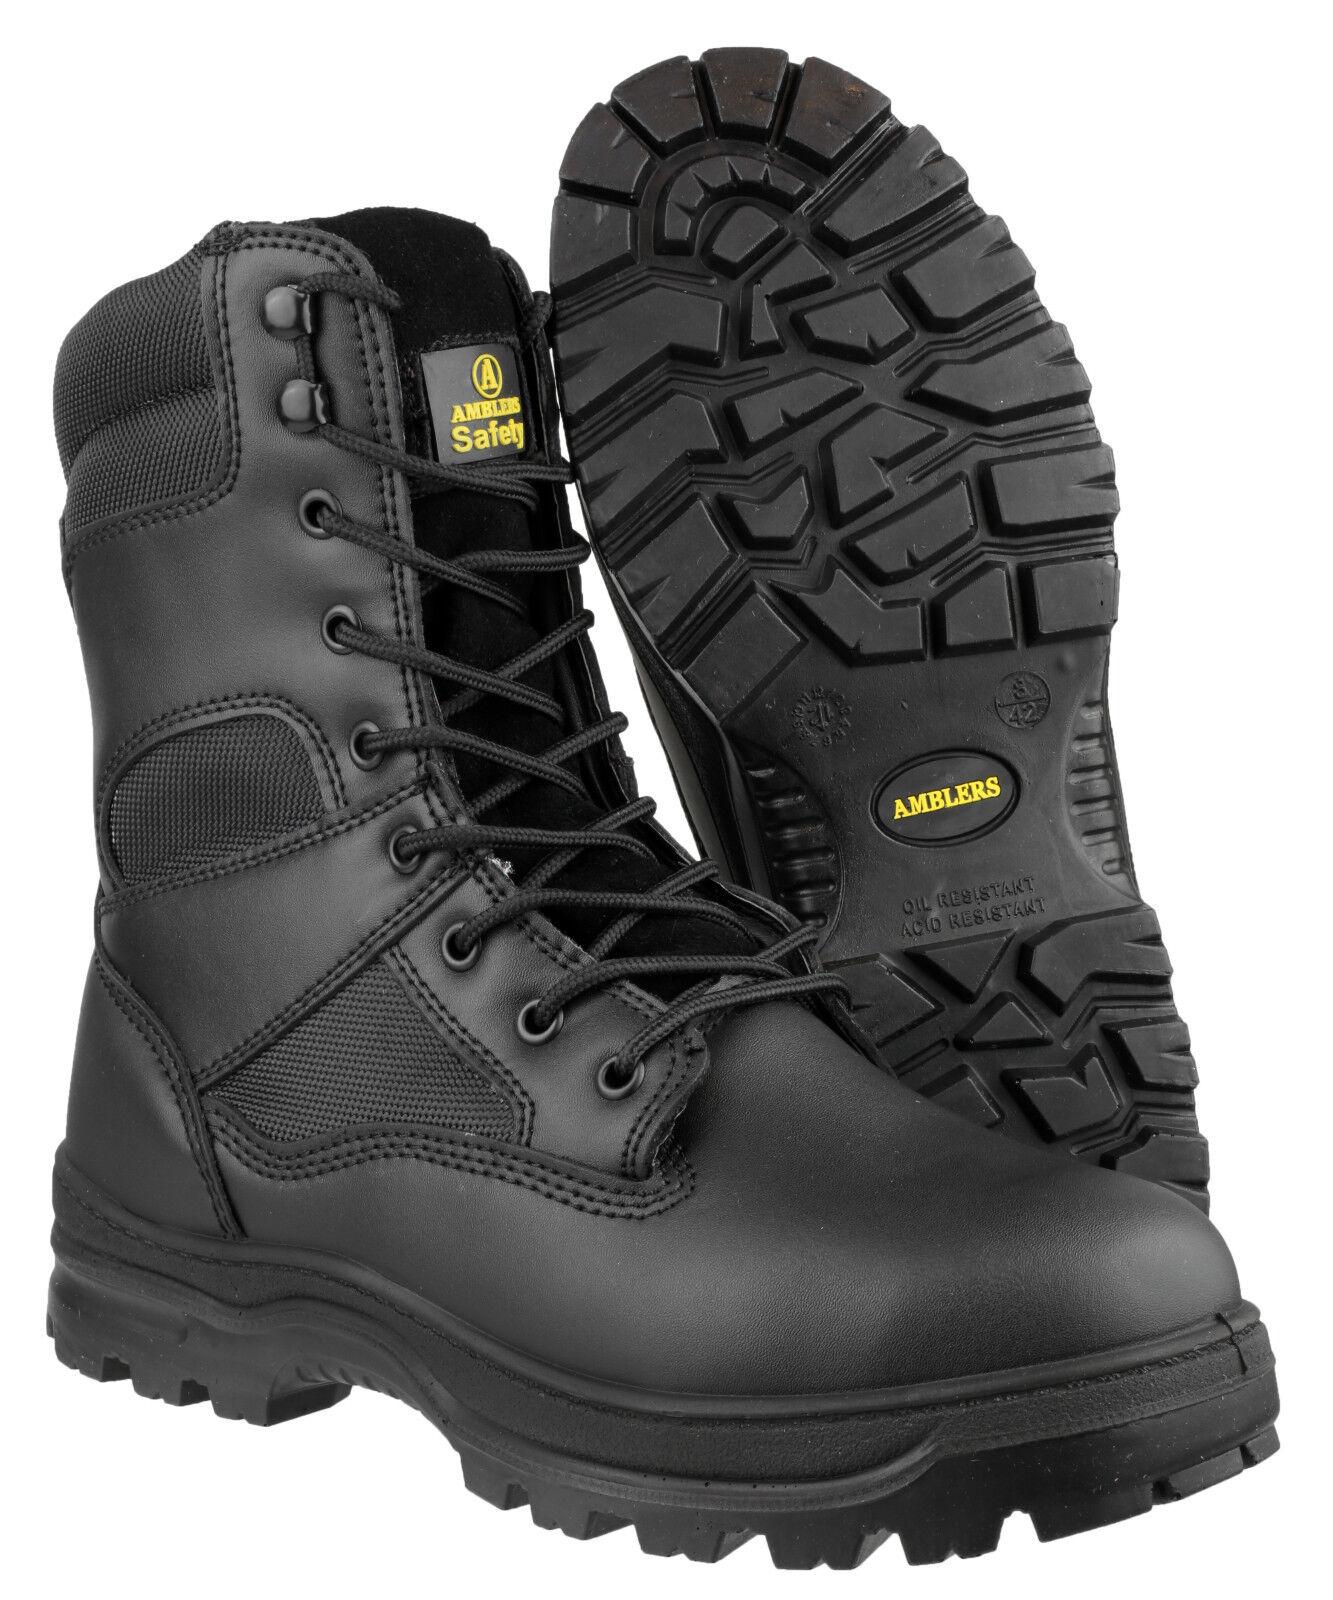 Amblers fs008 Acciaio da Uomo Sicurezza Punta Acciaio fs008 Scarpe Stivali industriale uk4-14 55acee